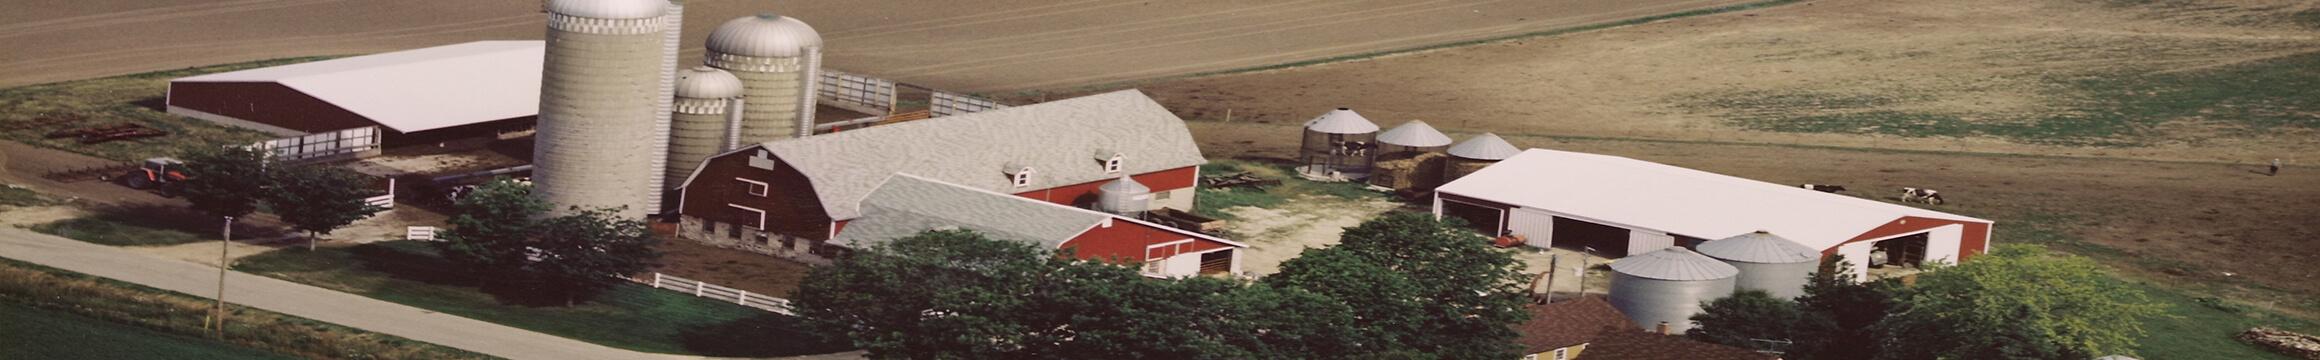 Custom Farm